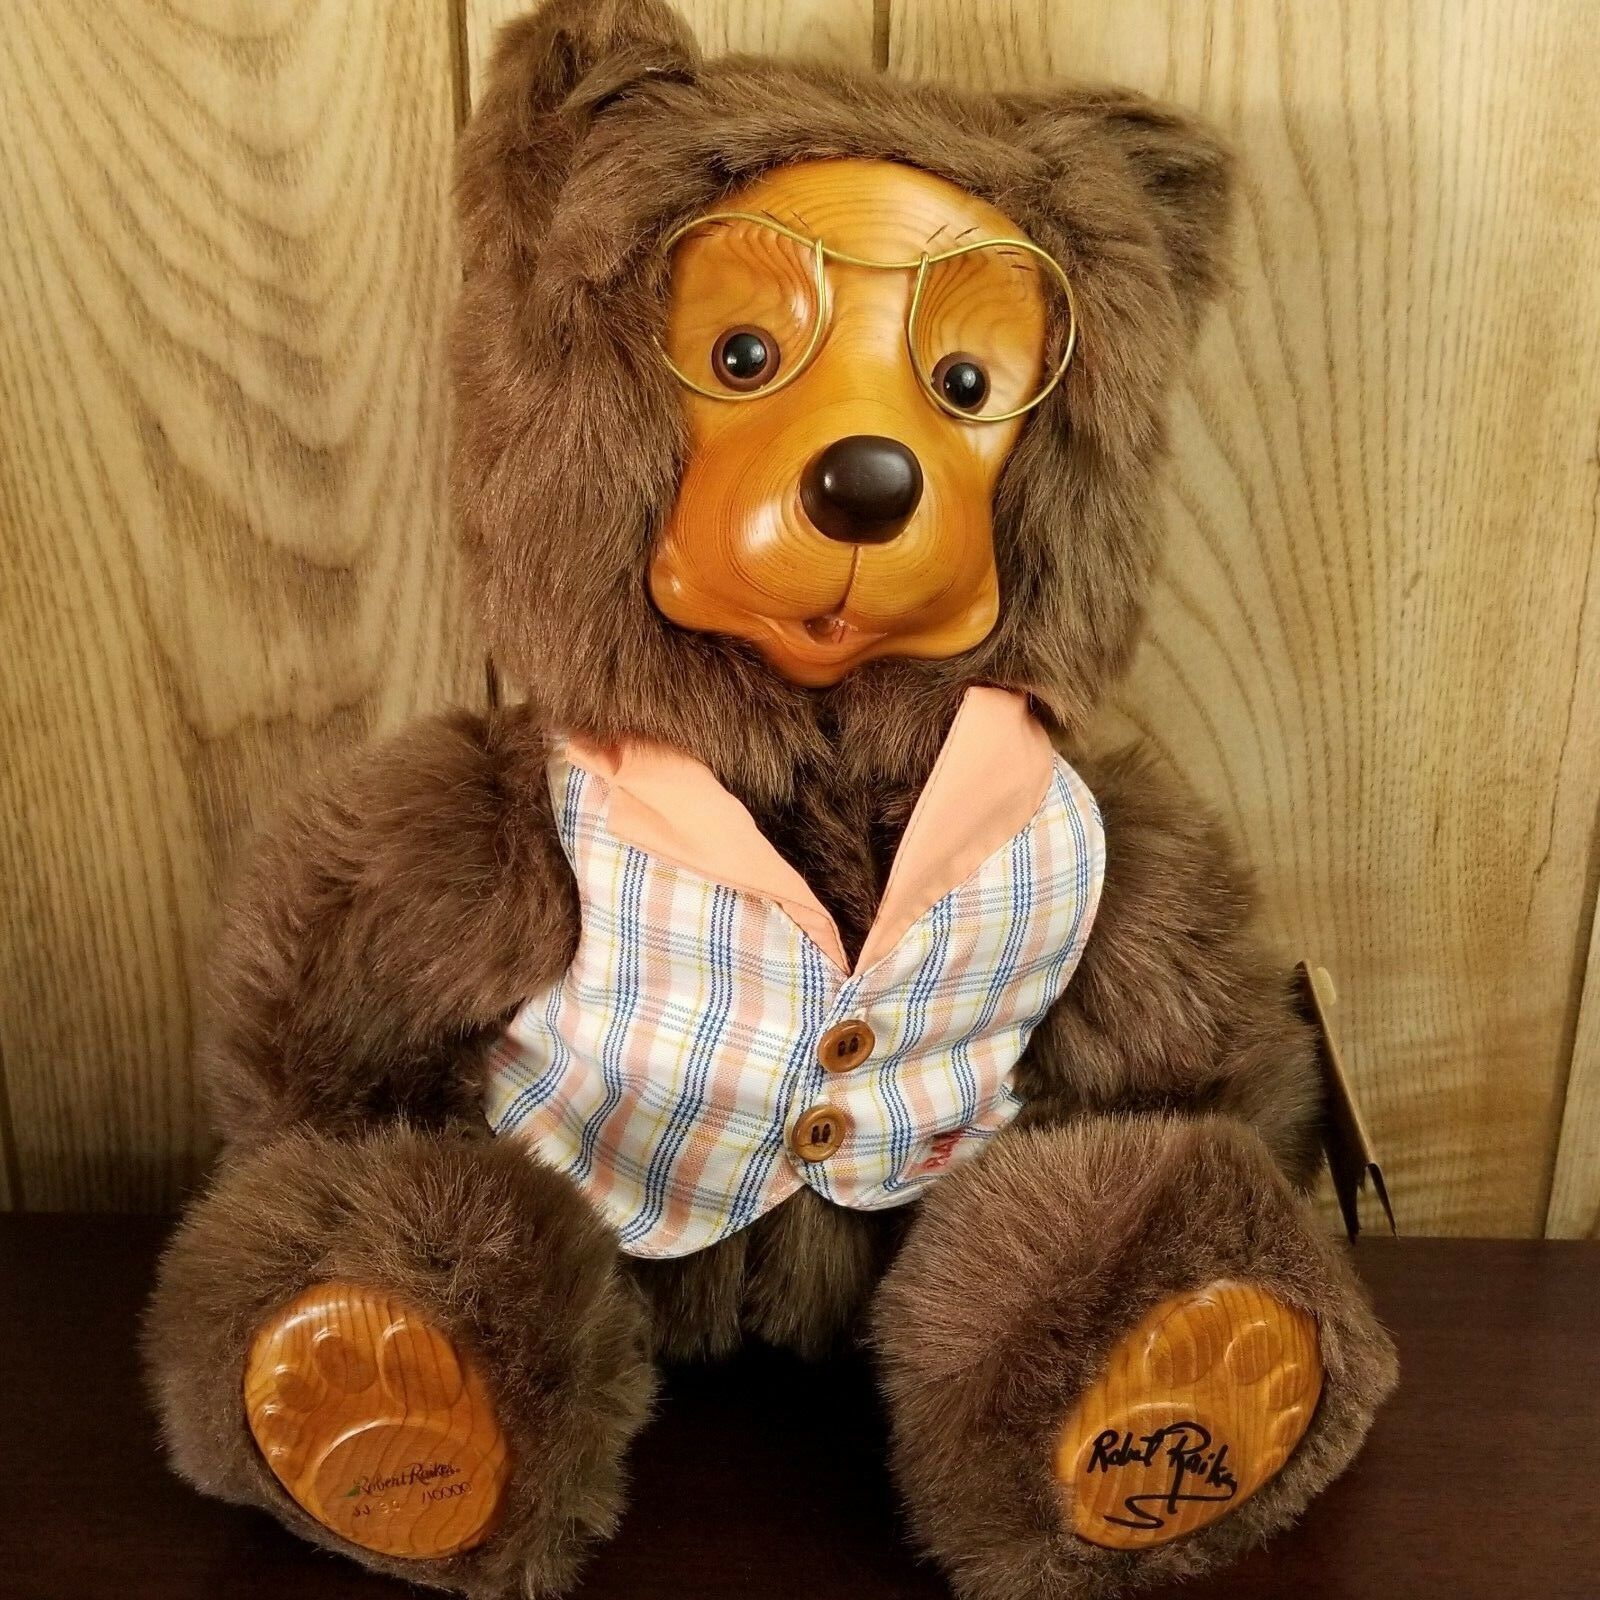 1988 Raikes JASON 17015 Home Sweet Home Plush Teddy Bear with Glasses COA Boxed